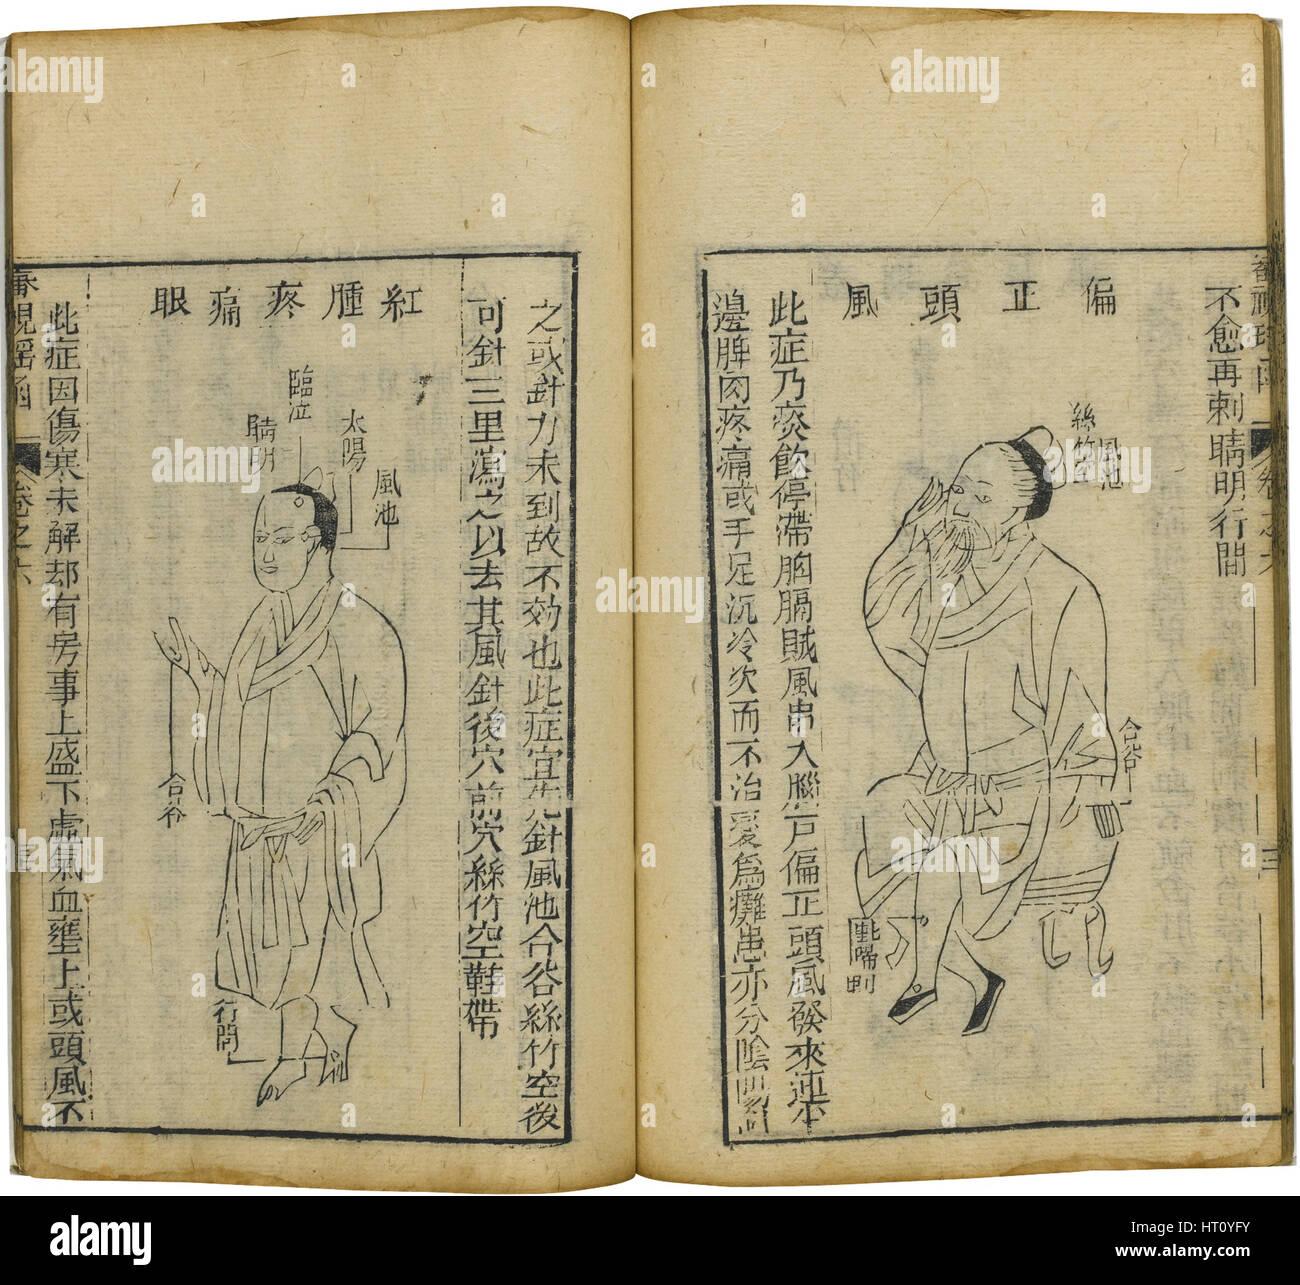 Shen Shi Yao Han (A Precious Book of Ophthalmology), 1644. Artist: Fu Renyu (active Mid of 17th cen.) - Stock Image